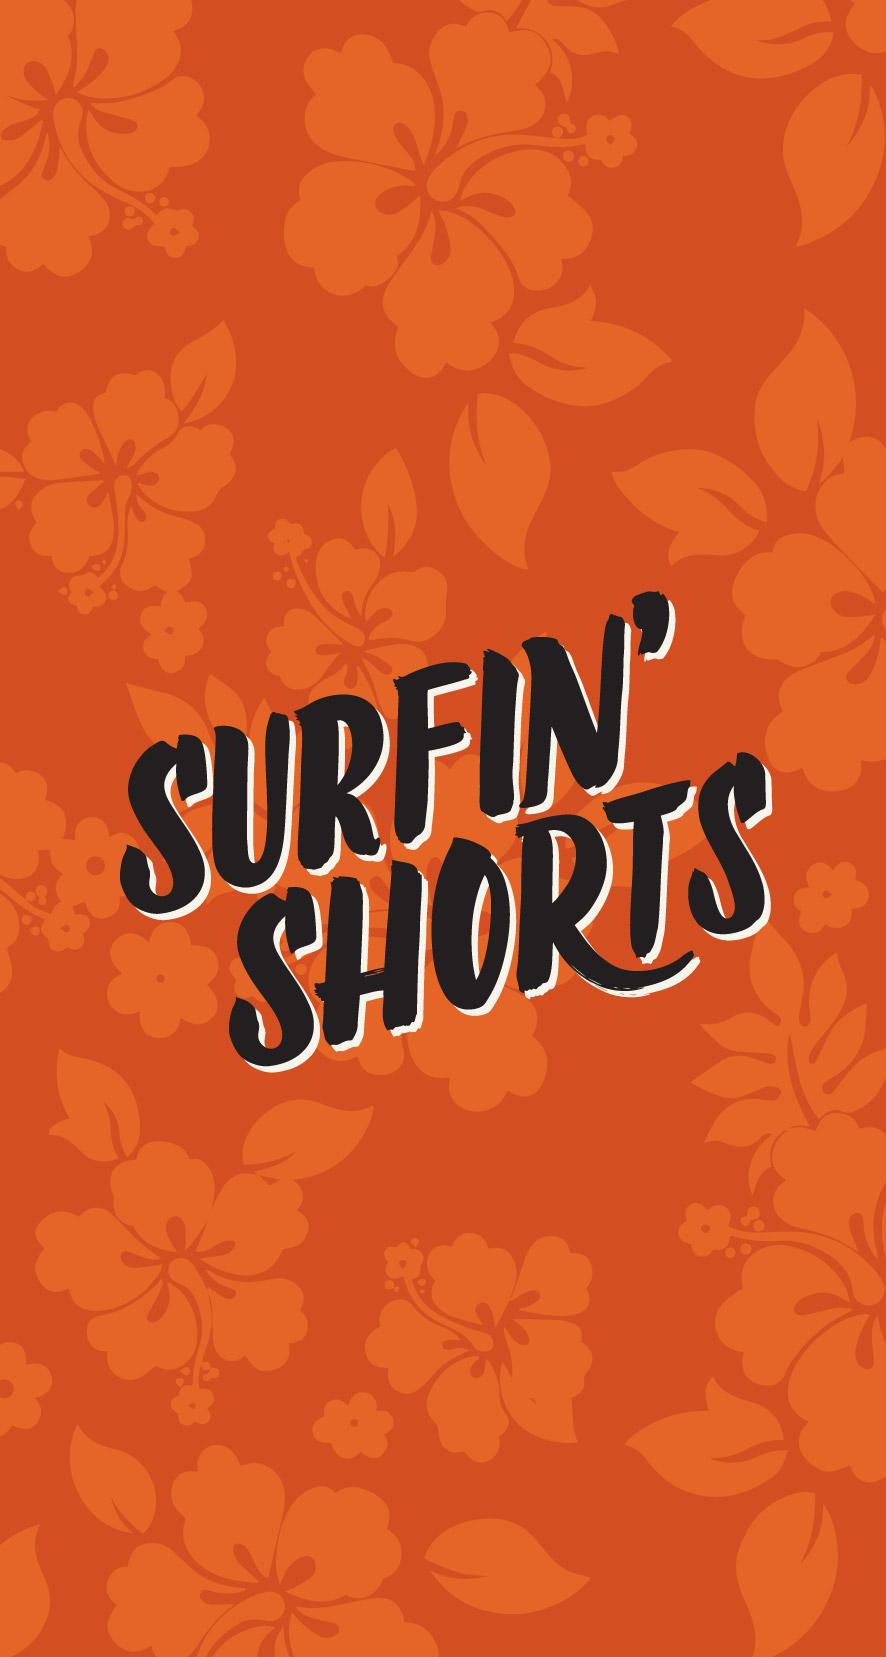 Surfing Shorts 1960